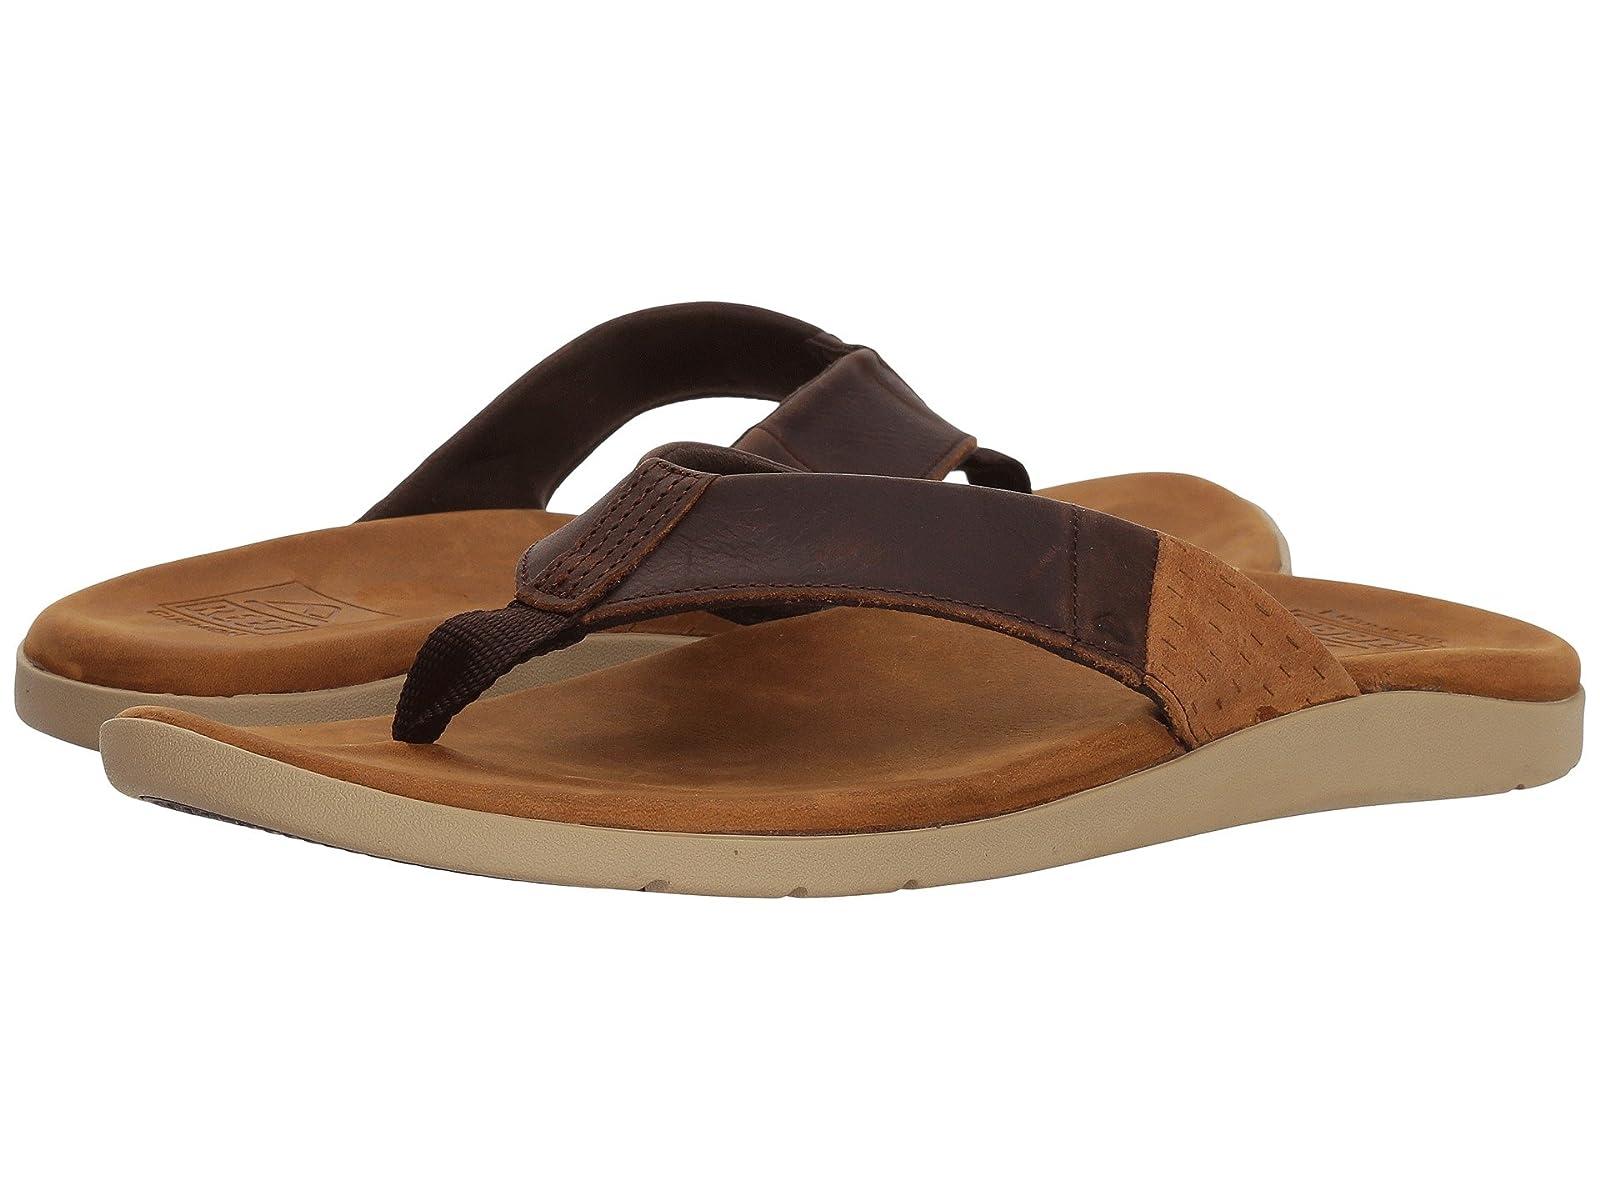 Reef Cushion J-BayAtmospheric grades have affordable shoes